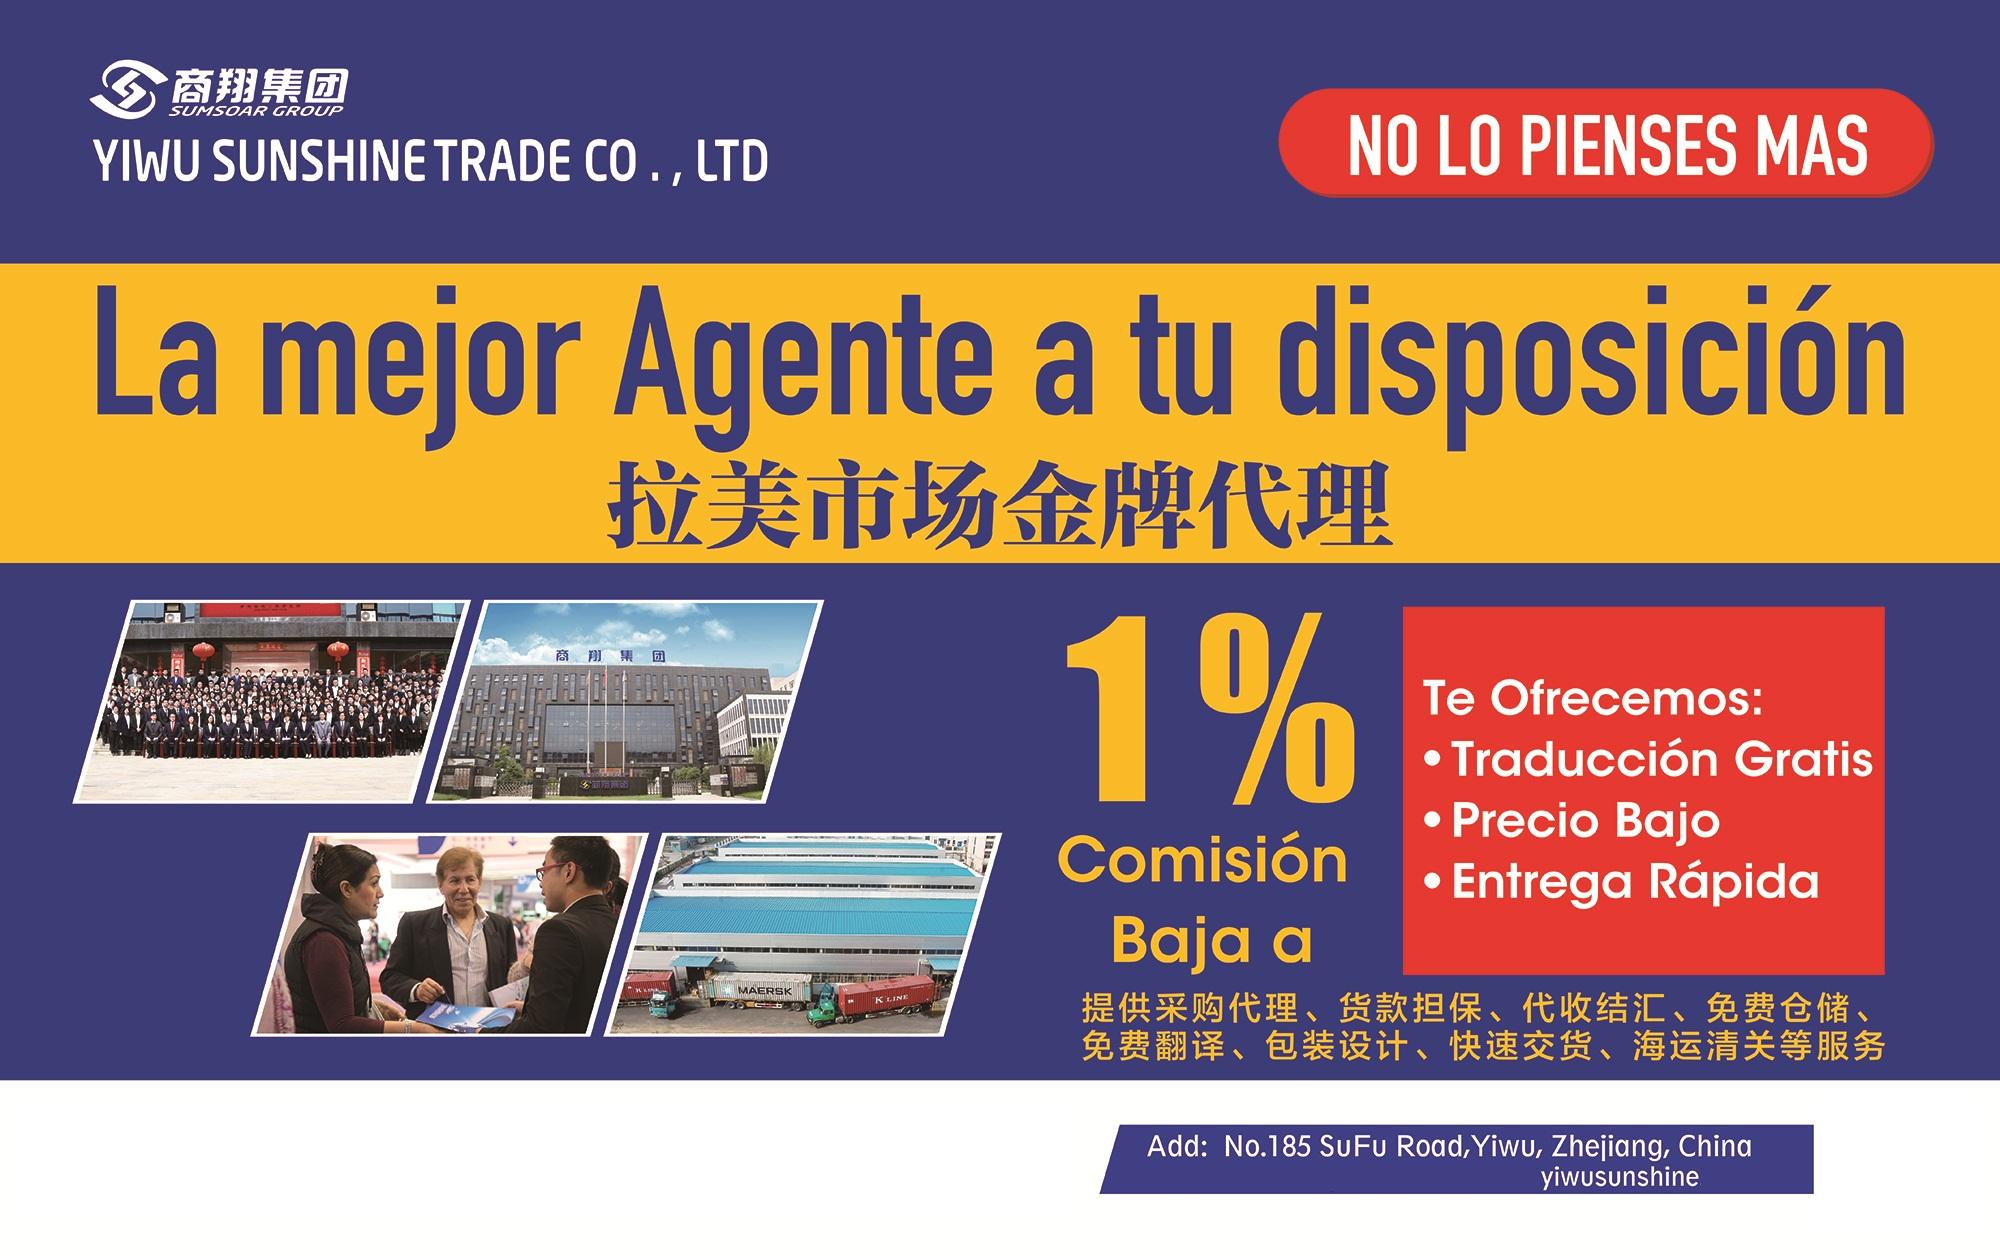 Yiwu Sunshine Trade Co Ltd Agency Broker Wanted,China Amazon 1688 Jewelry  Socks Sourcing Dropshipping Agent - Buy Yiwu Sunshine,Jewelry Sourcing